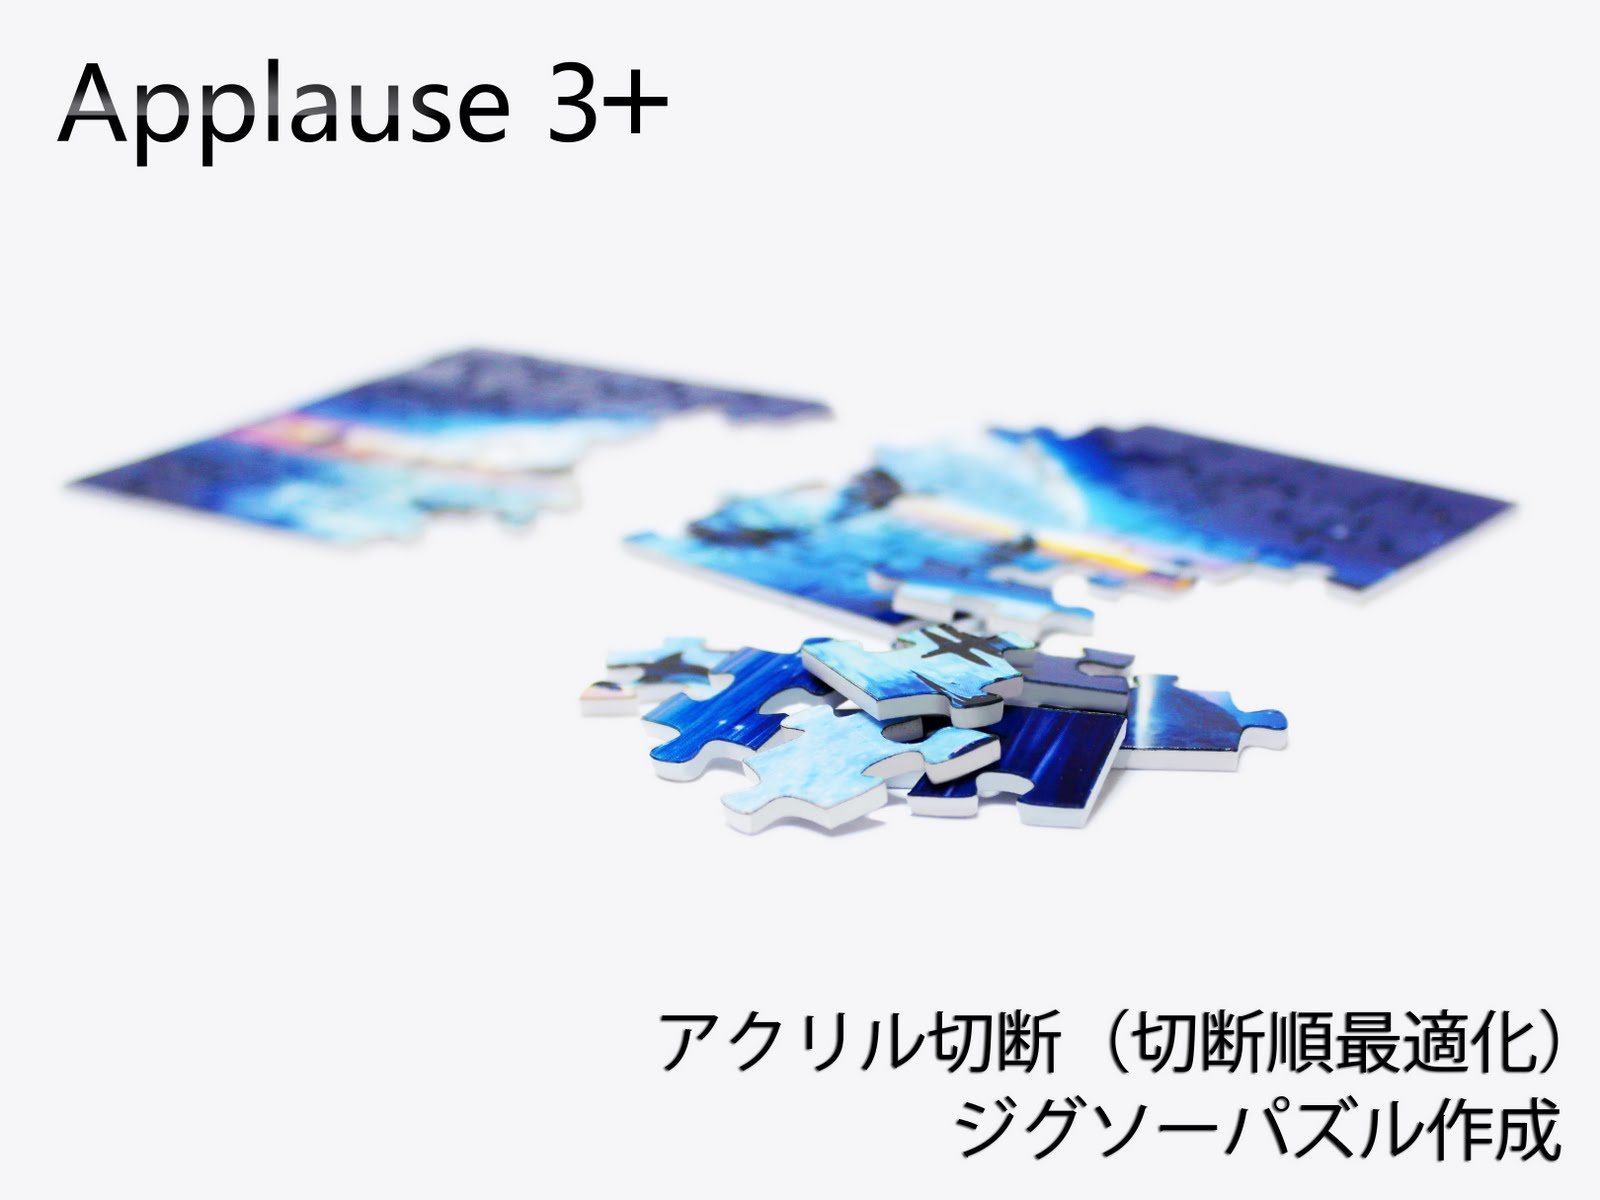 Applause 3+レーザー加工機:ジグソーパズル加工写真2